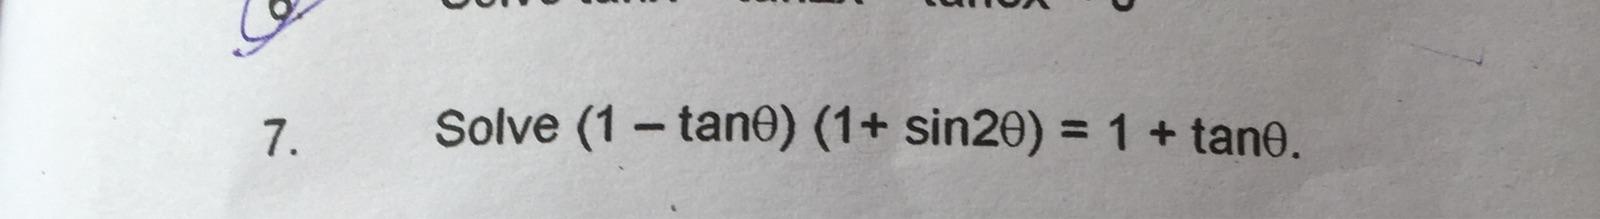 X Solve 1 Tan Theta 1 Sin 2 Theta 1 Tan Theta